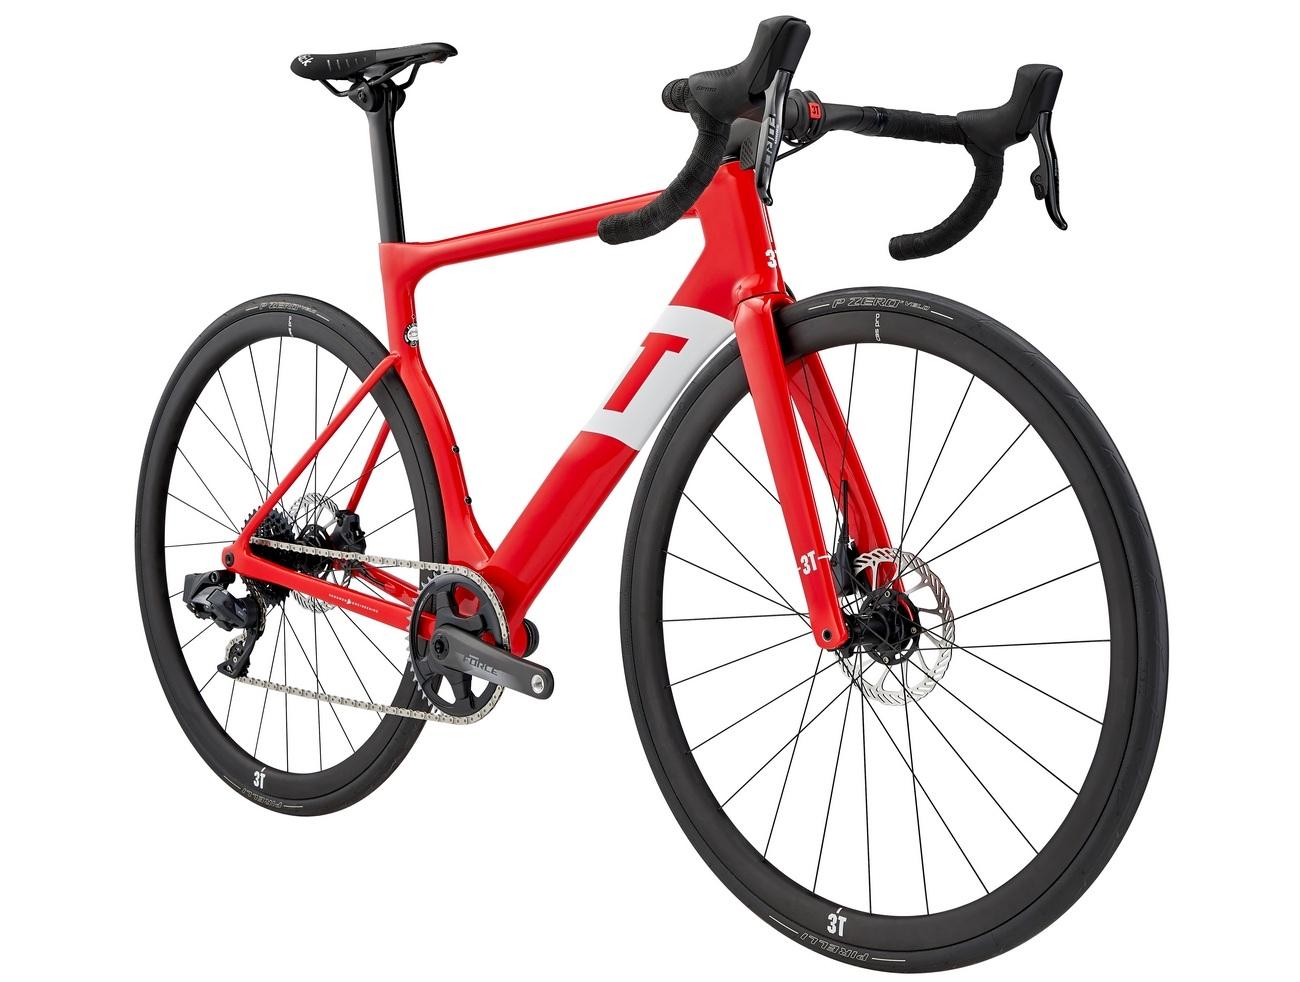 3T_Strada_Bike